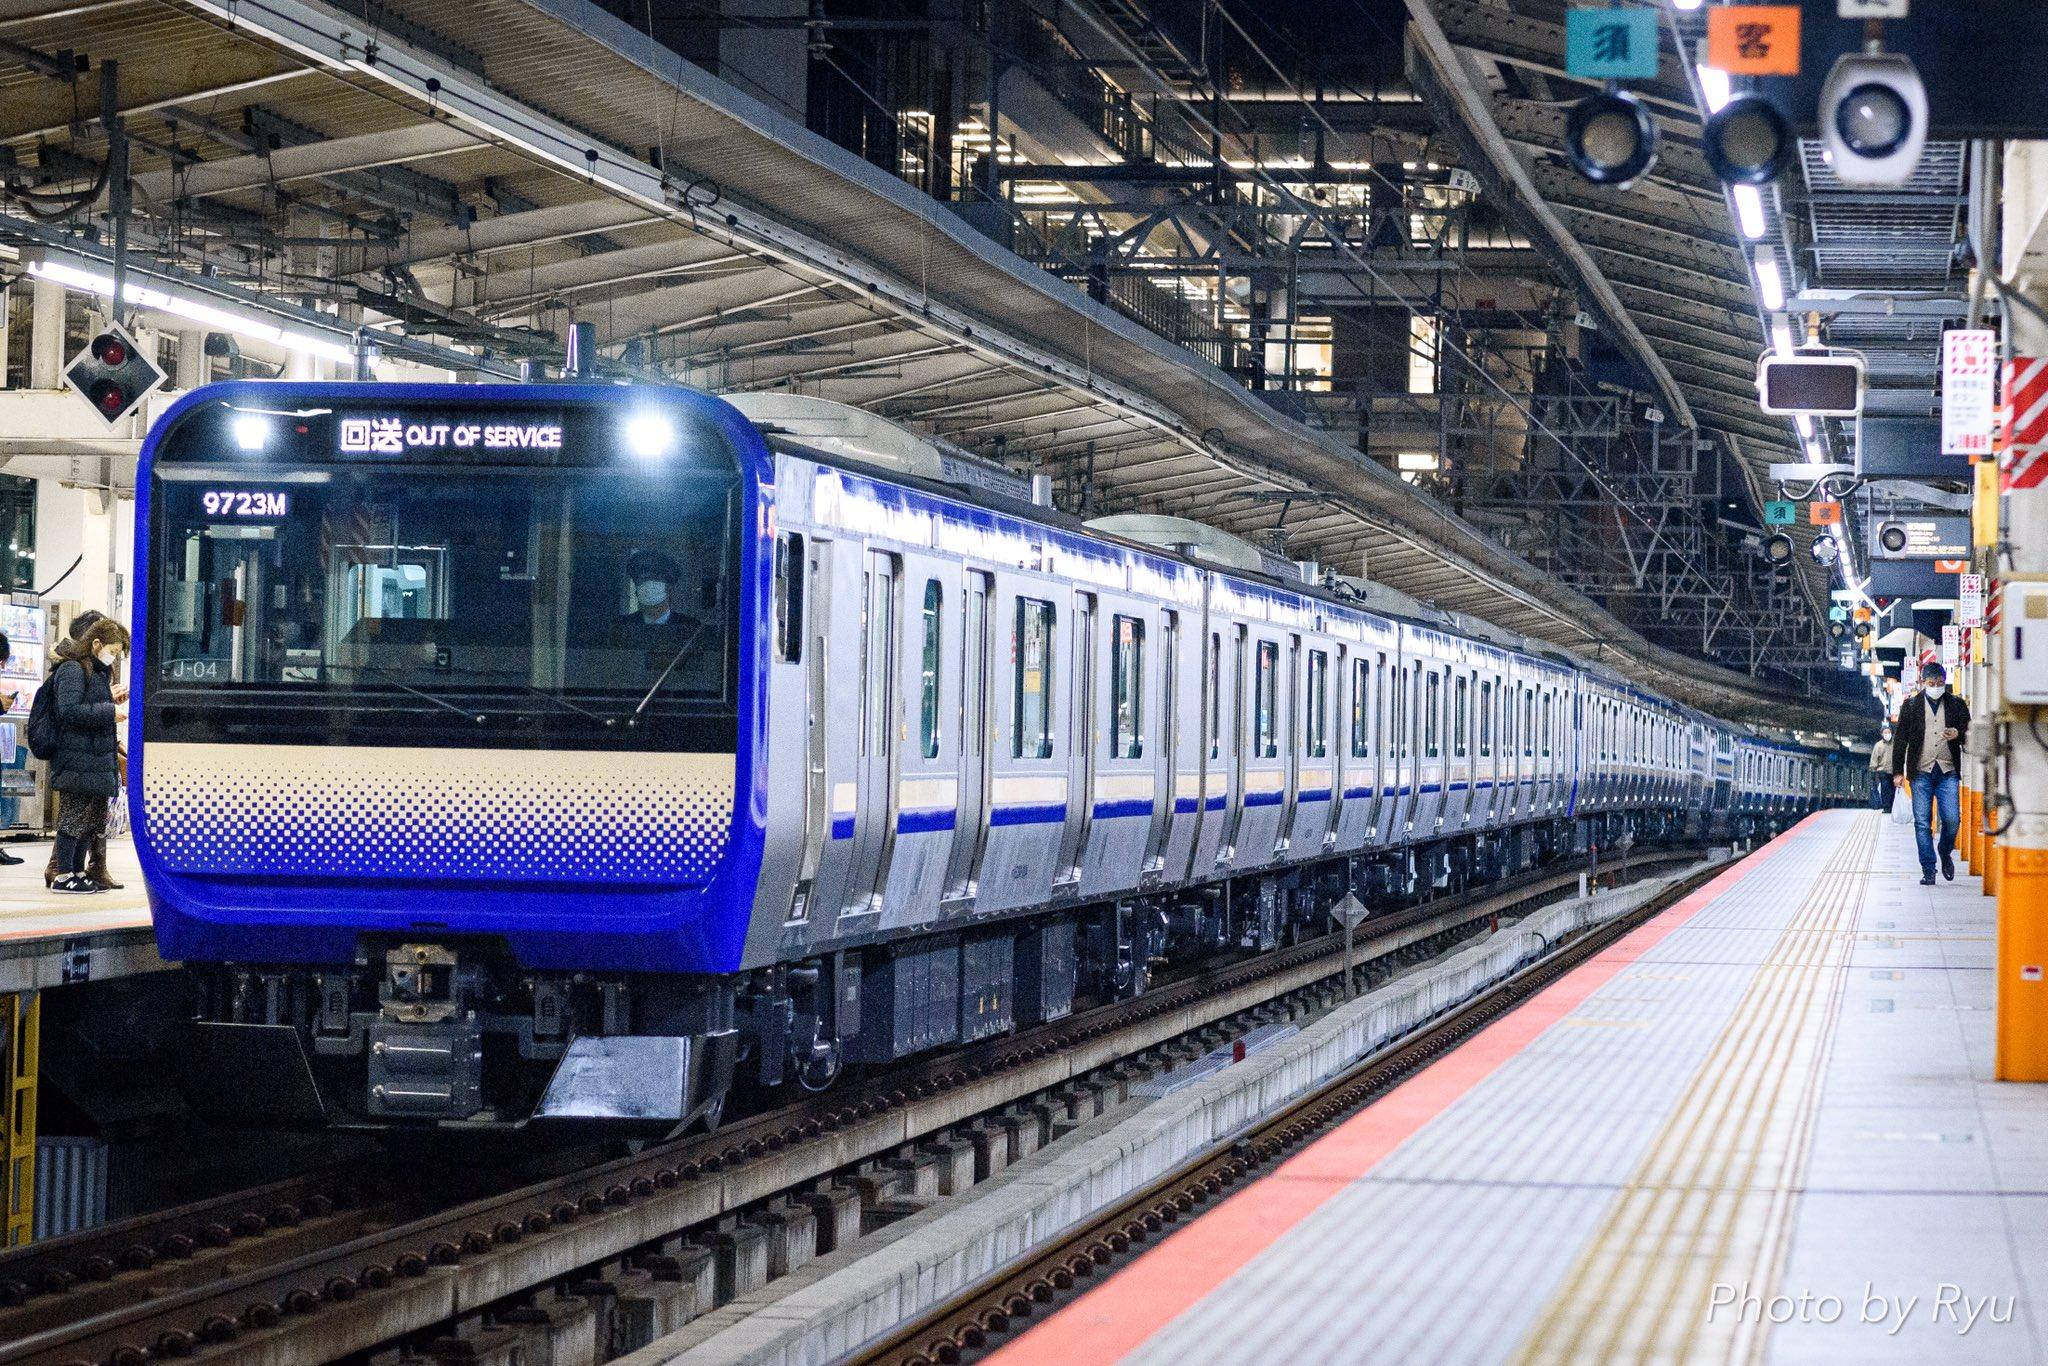 E235系1000番台J-04+F-04編成 幕張から鎌倉に疎開返却回送 営業運転開始か 運用は?